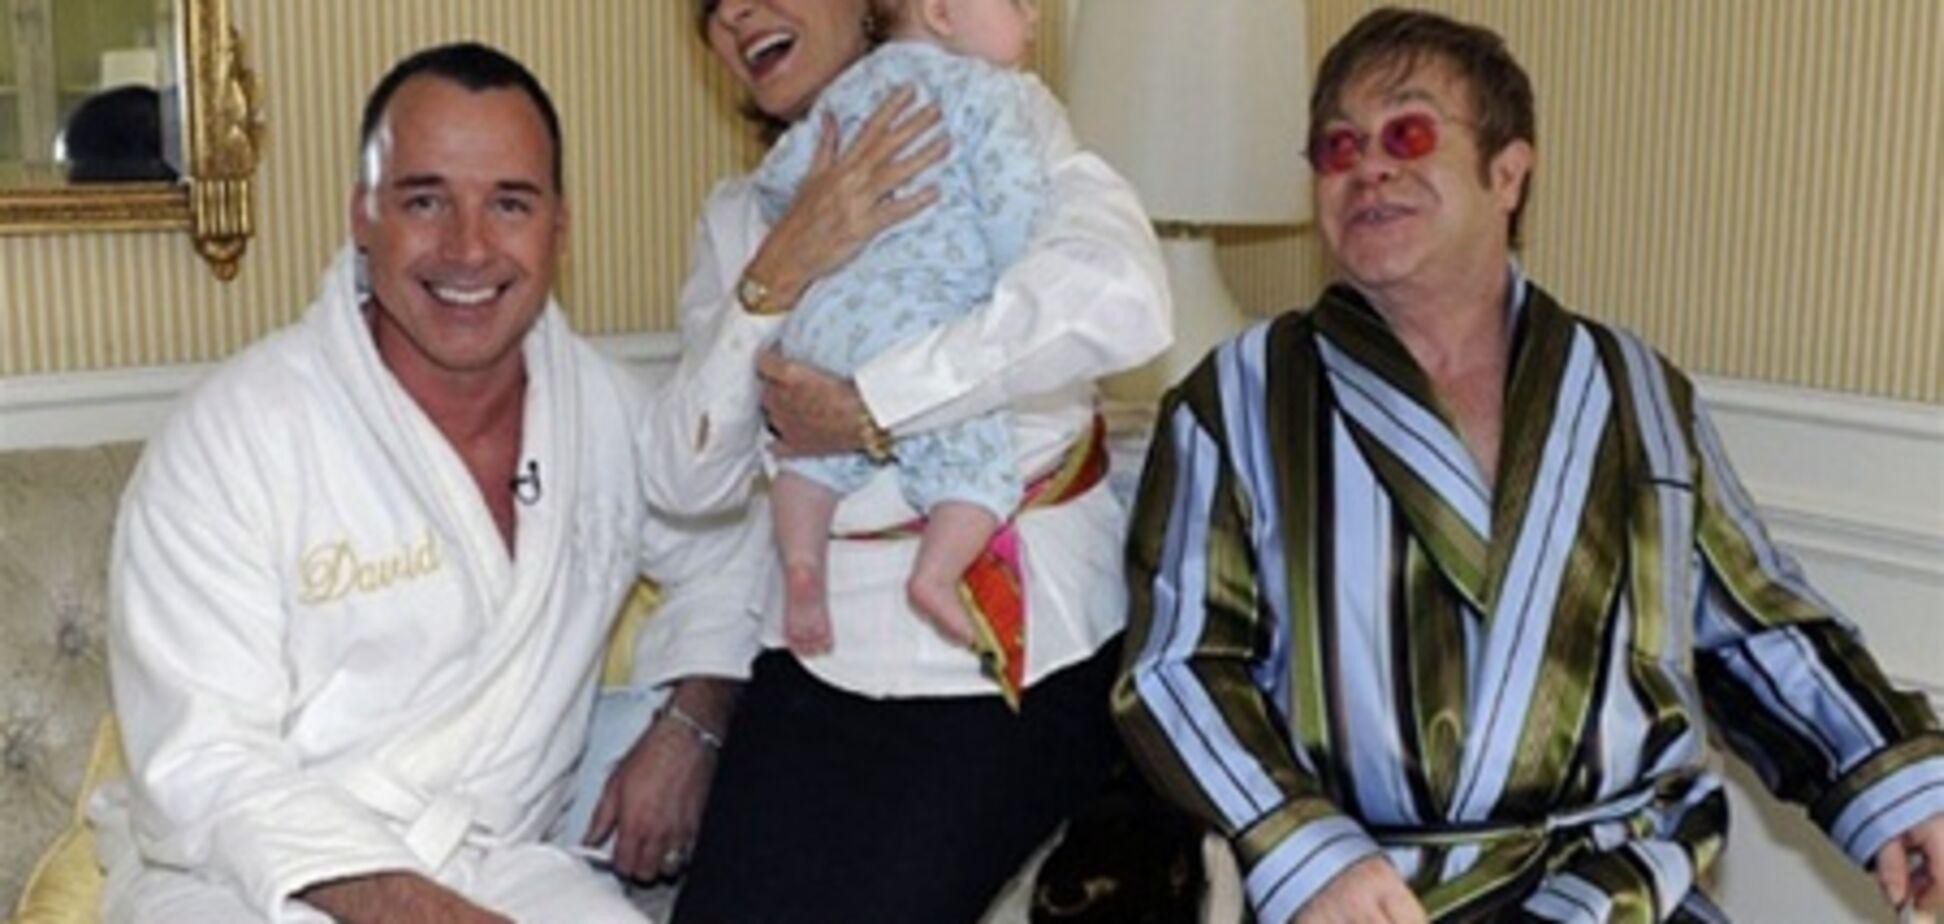 Сэр Элтон заплатил за ребенка $32 тысячи